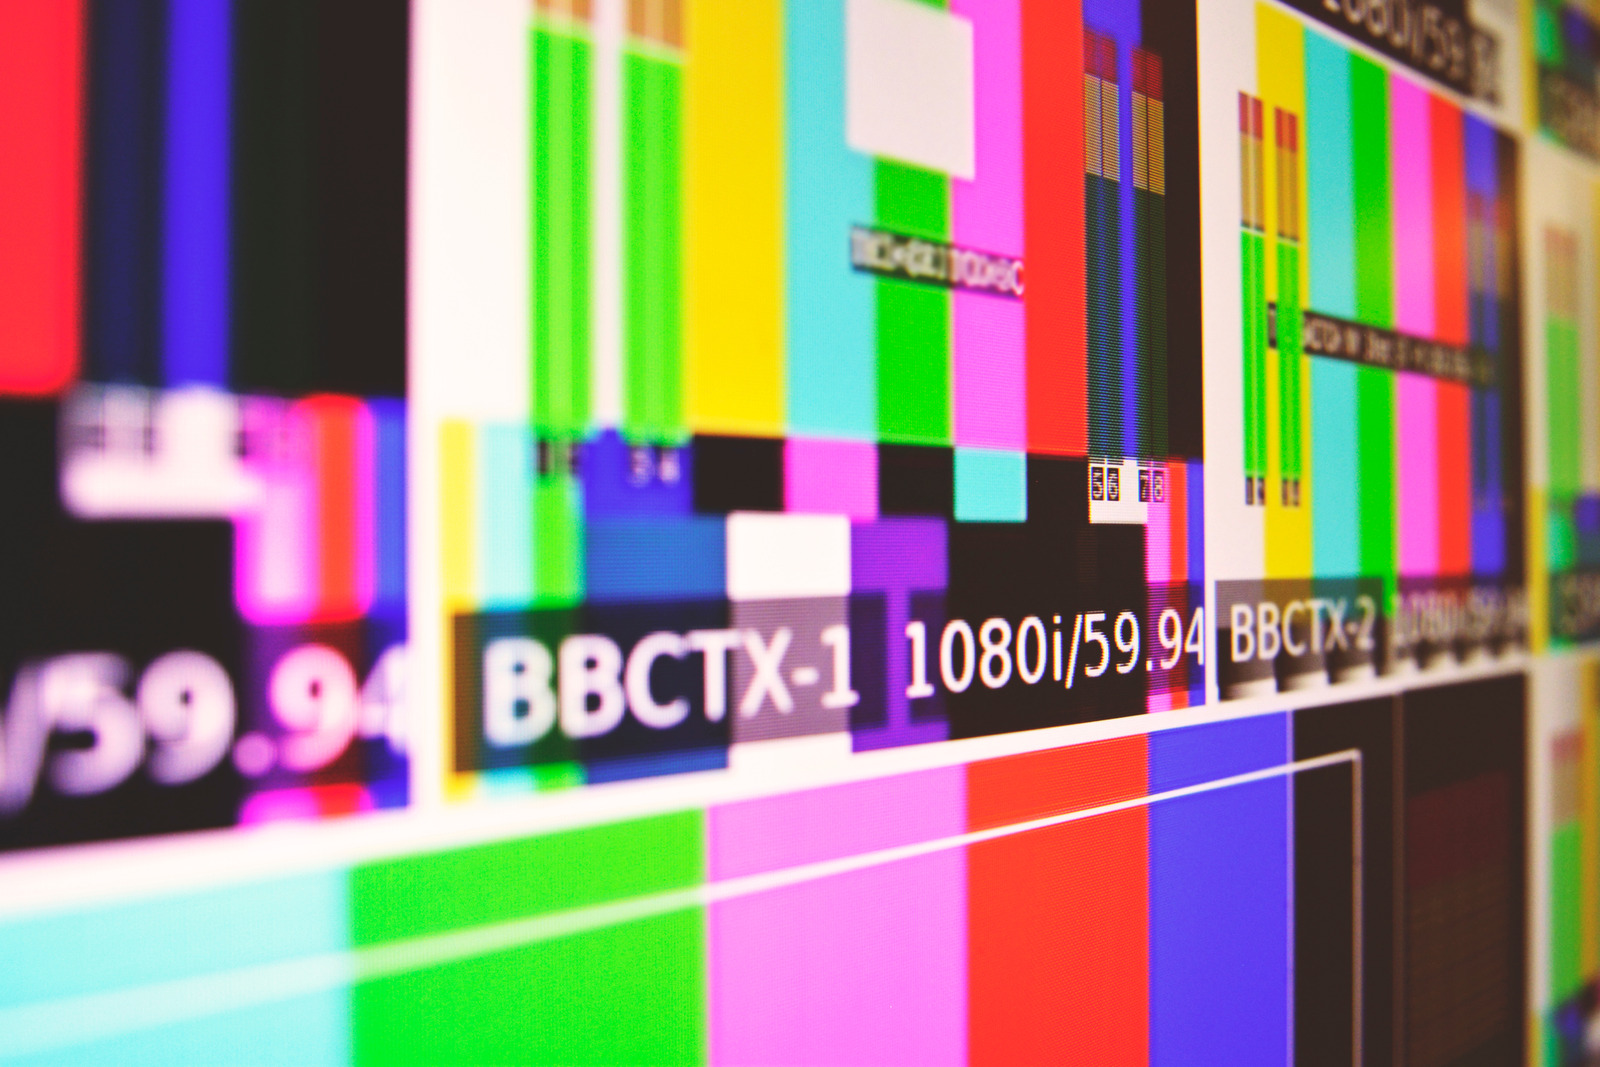 💶215 млн евро за телевизионные активы Lagardère